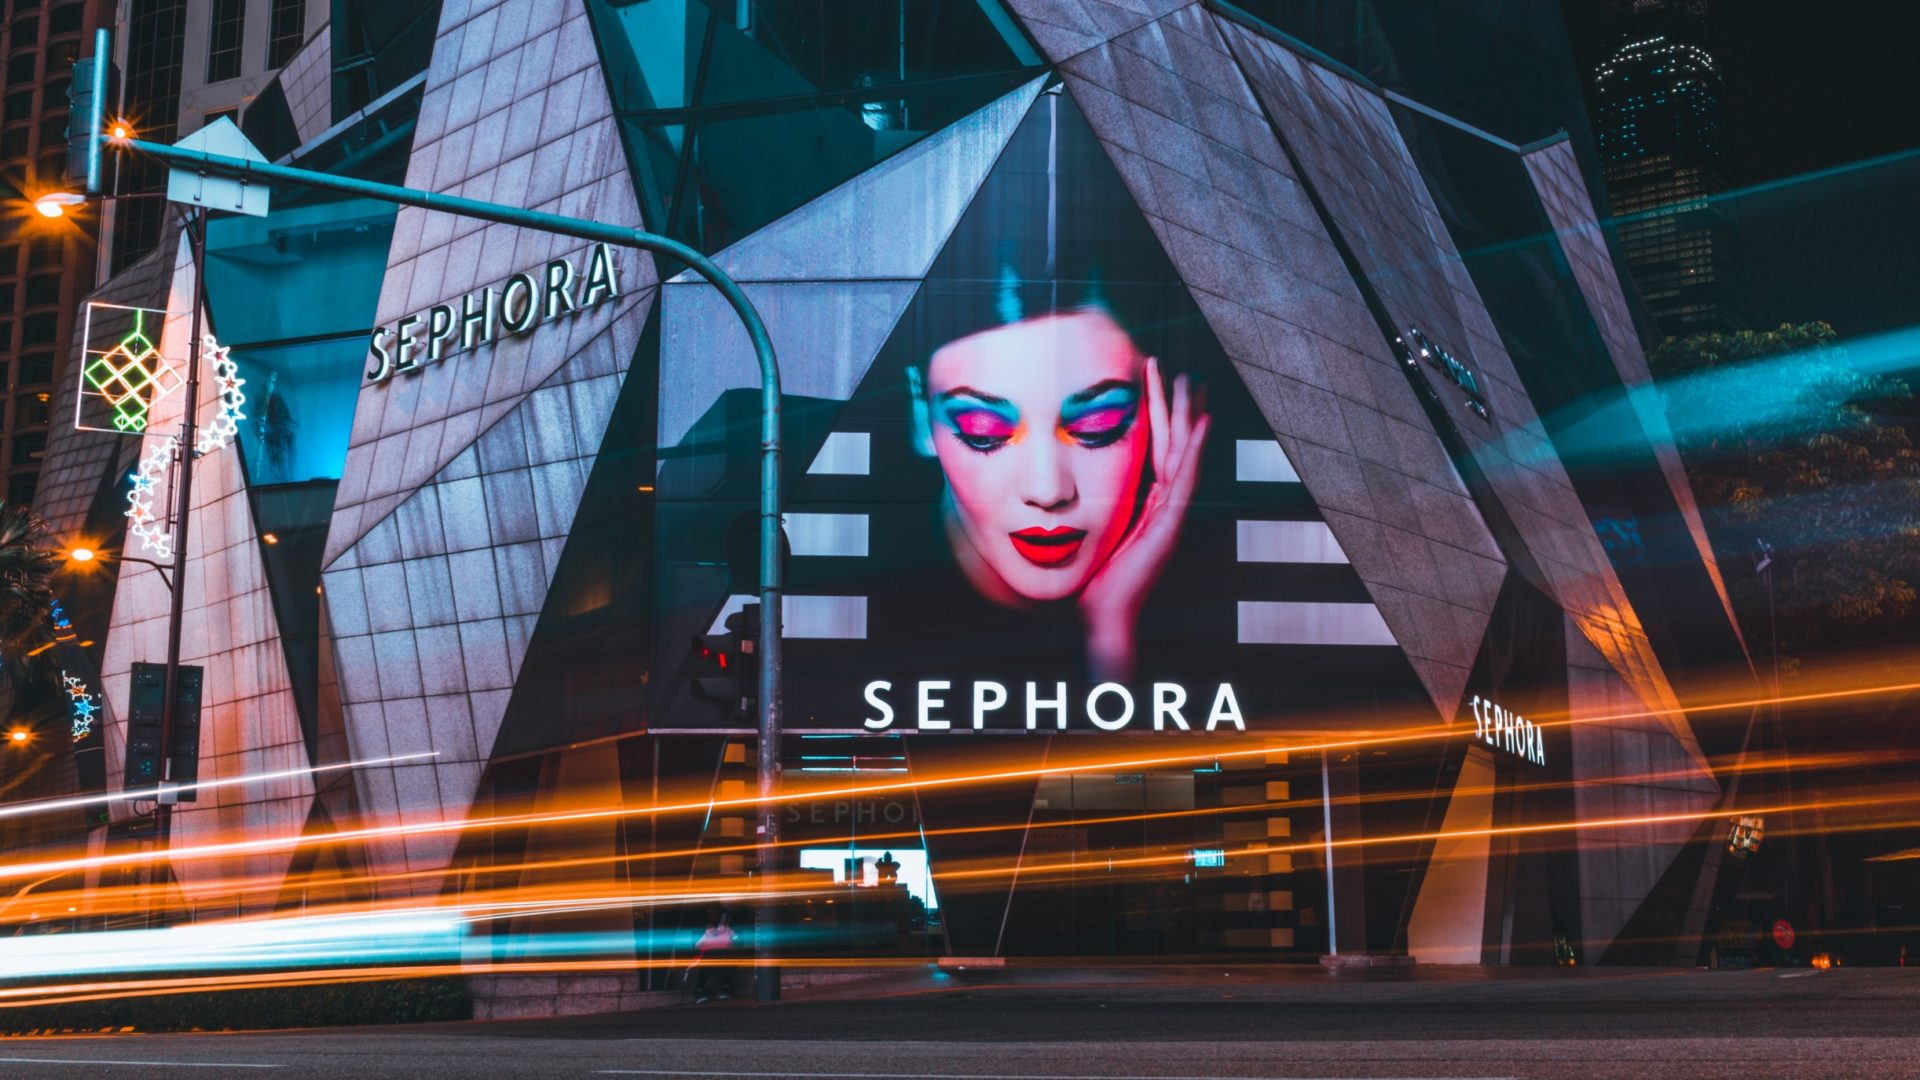 Spring Sale: Sephora Store Exterior